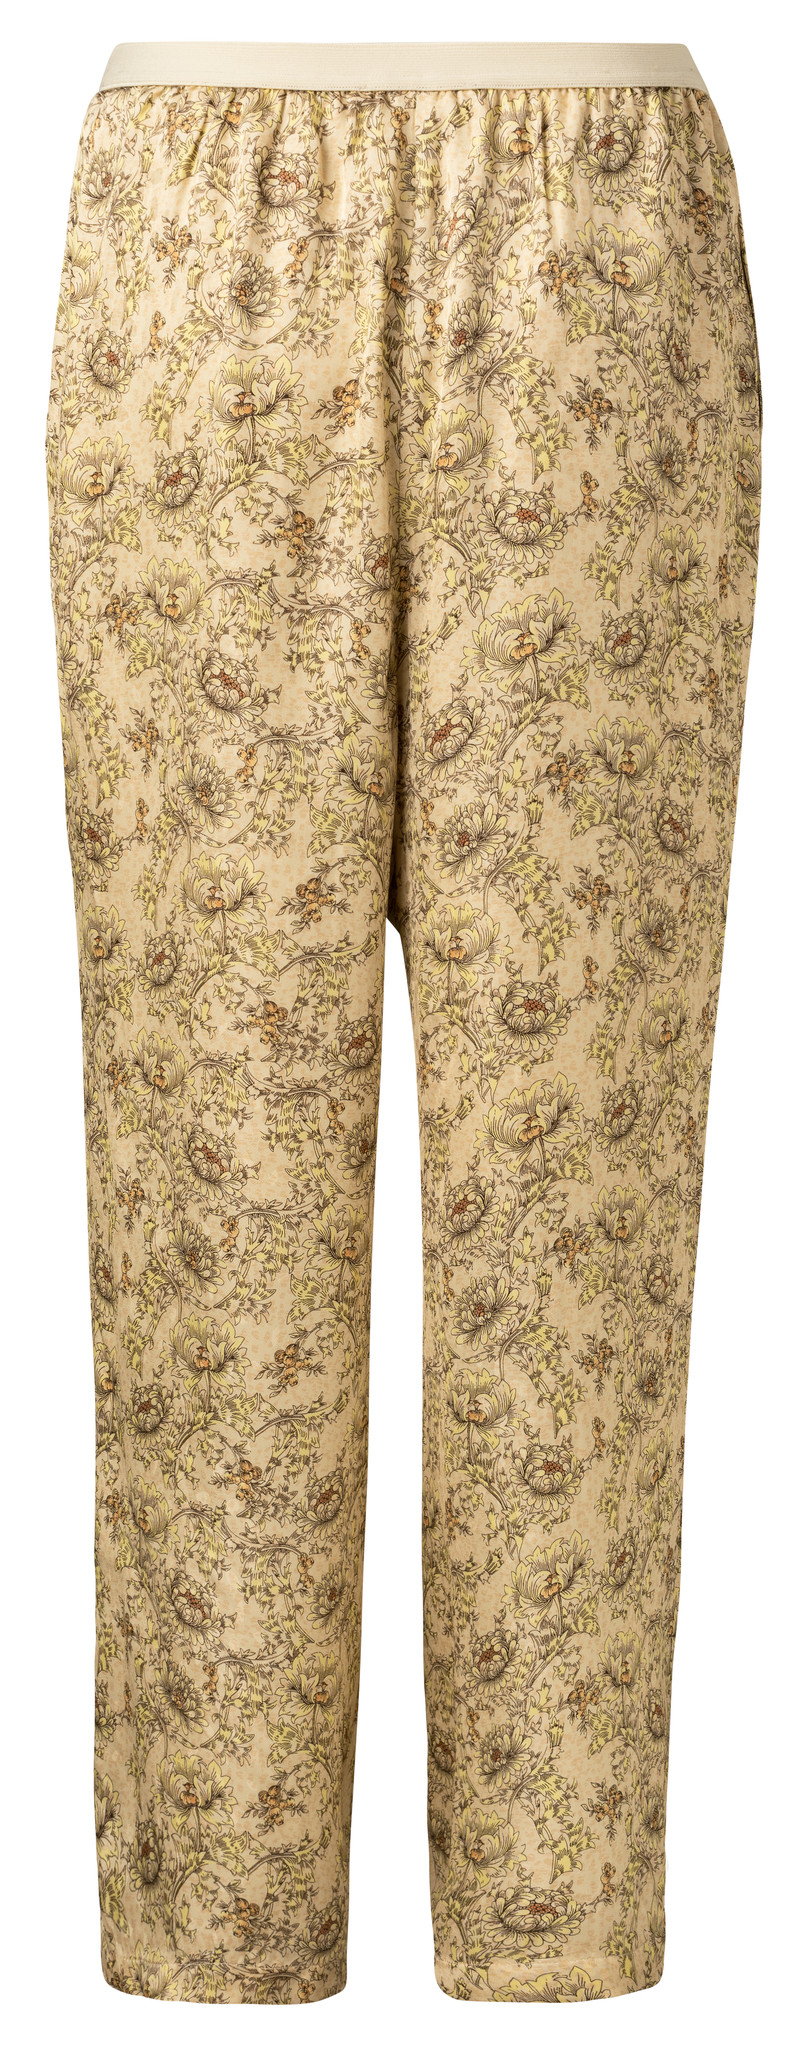 yaya Printed wide leg tro 1201143-115-3